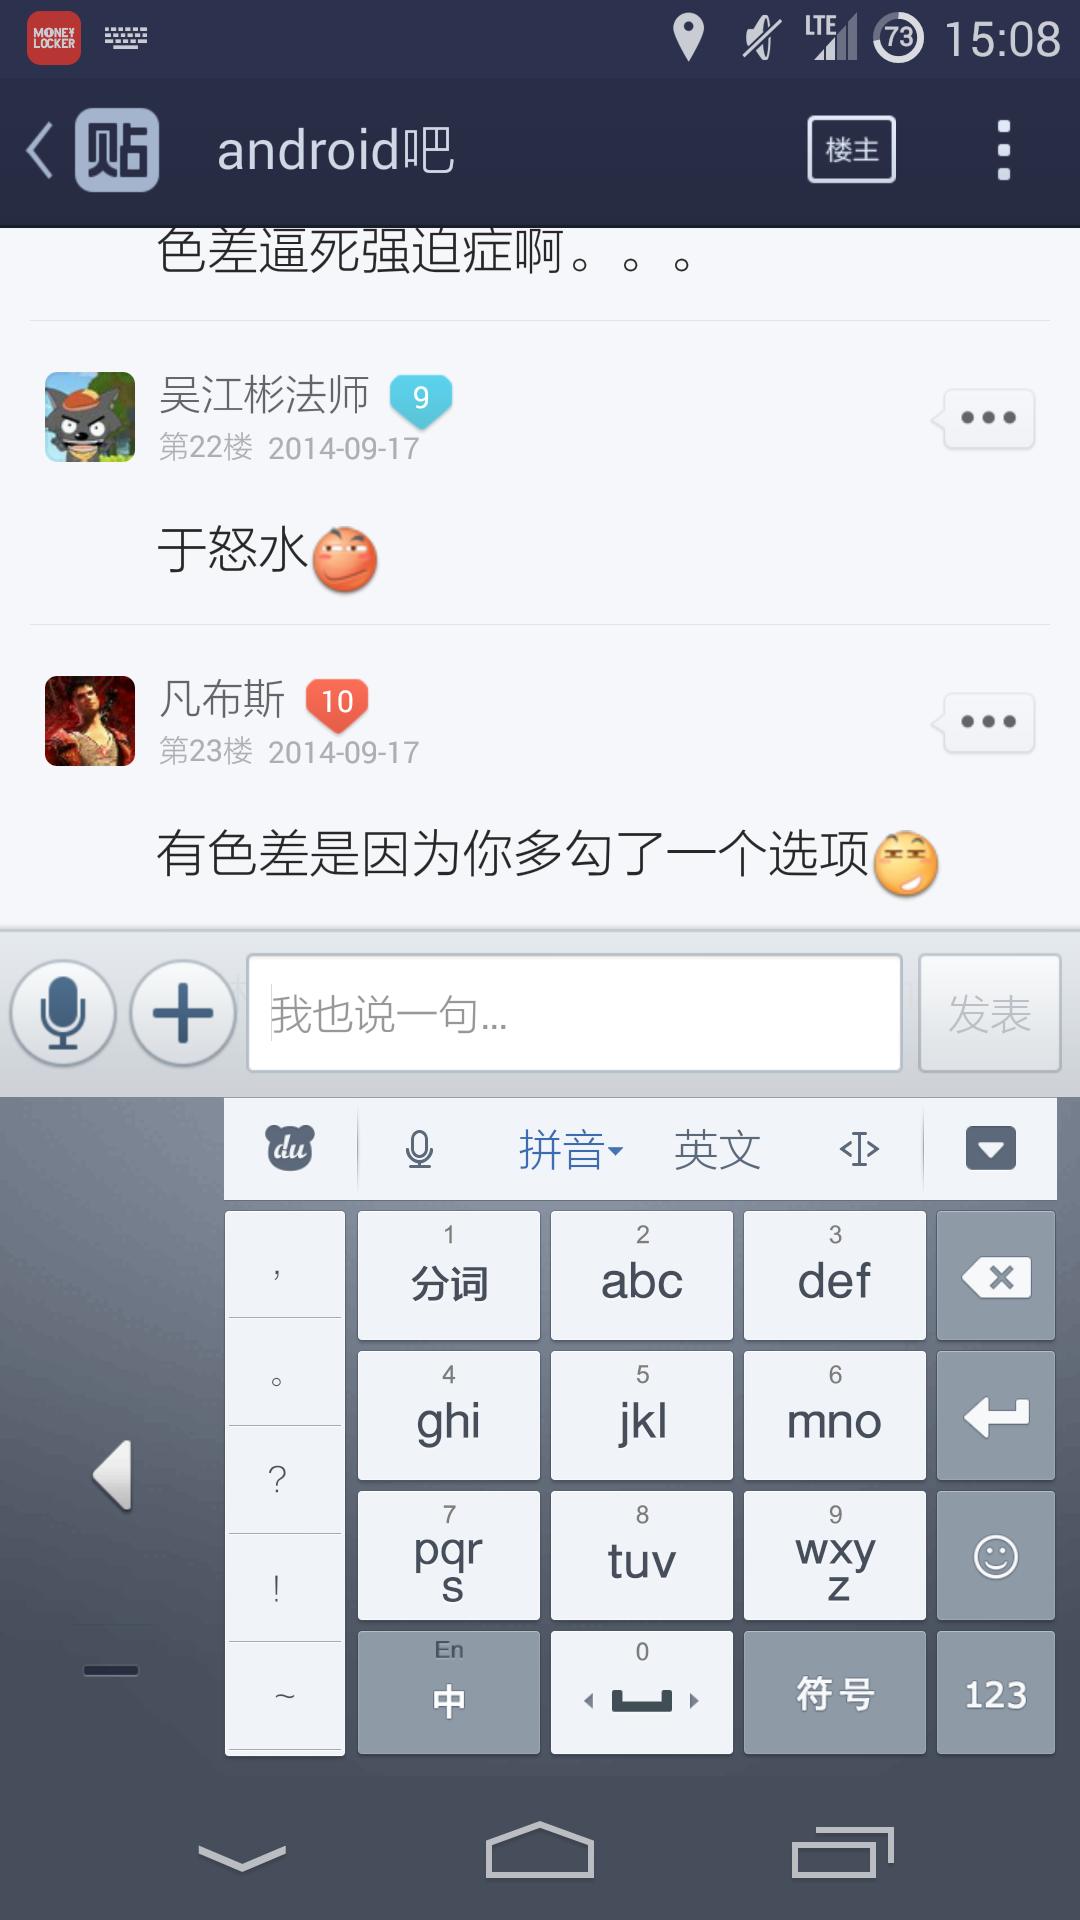 Screenshot_2013-09-17-15-08-48.png